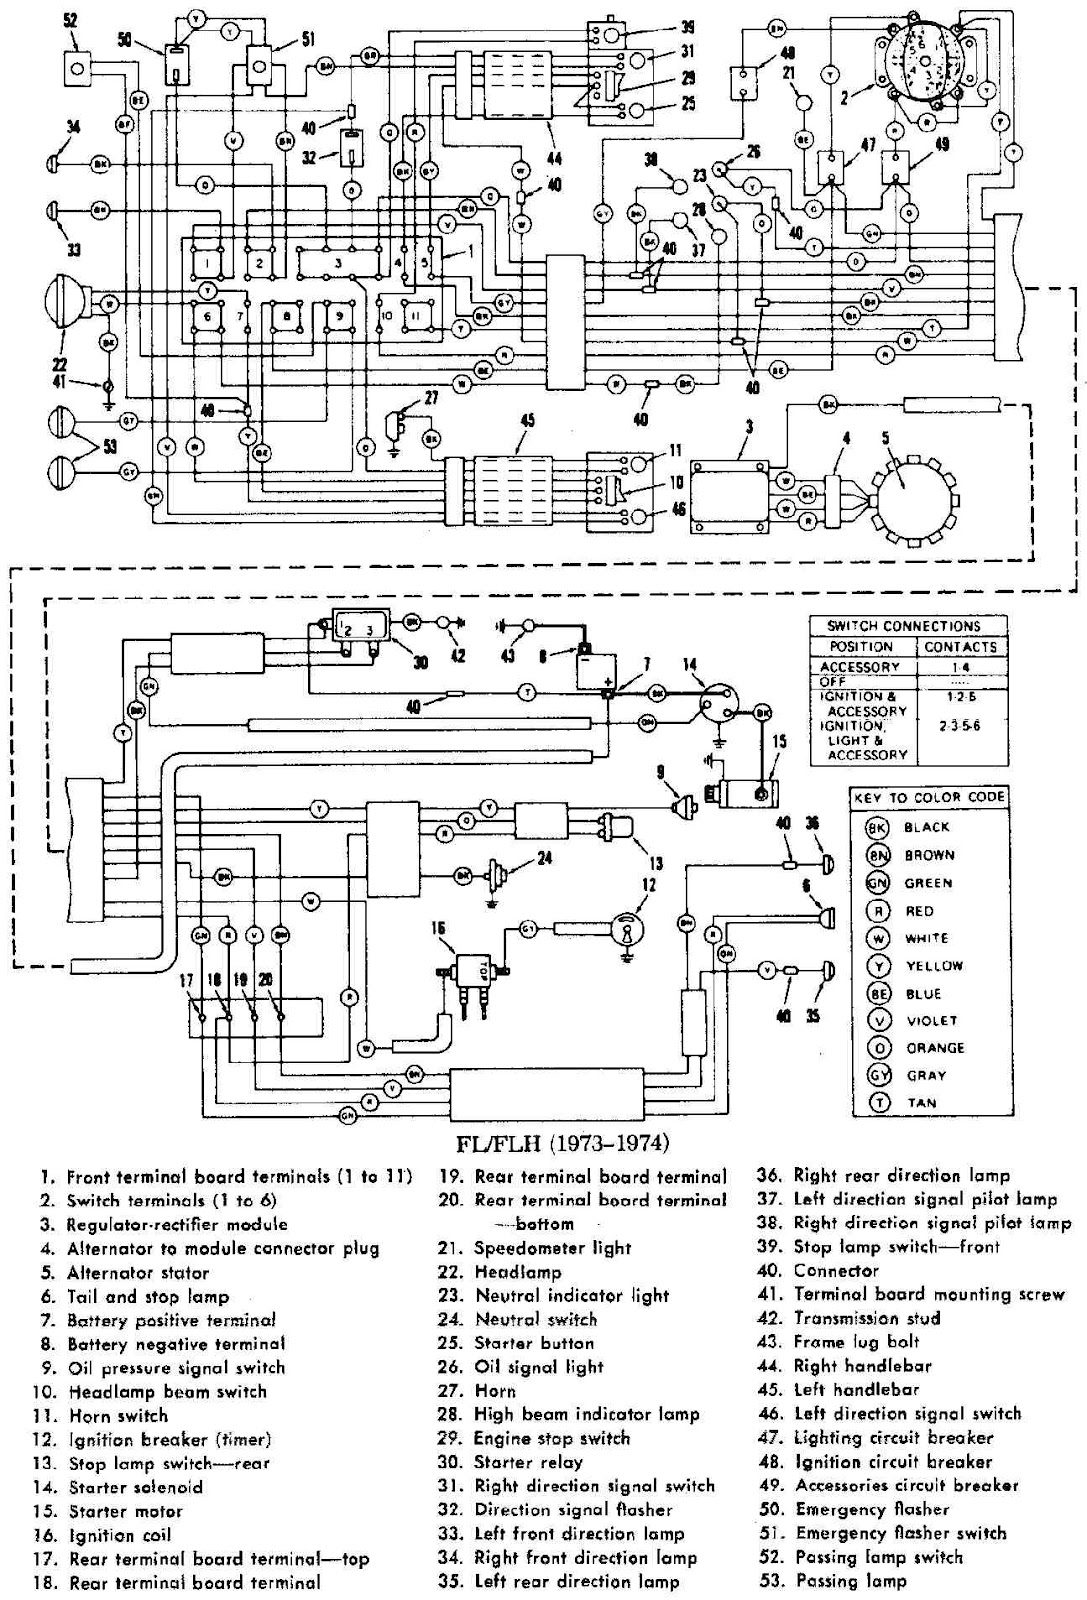 Strange Harley Davidson Flht Flhtc Fltr Wiring Diagram Online Wiring Diagram Wiring Cloud Licukaidewilluminateatxorg